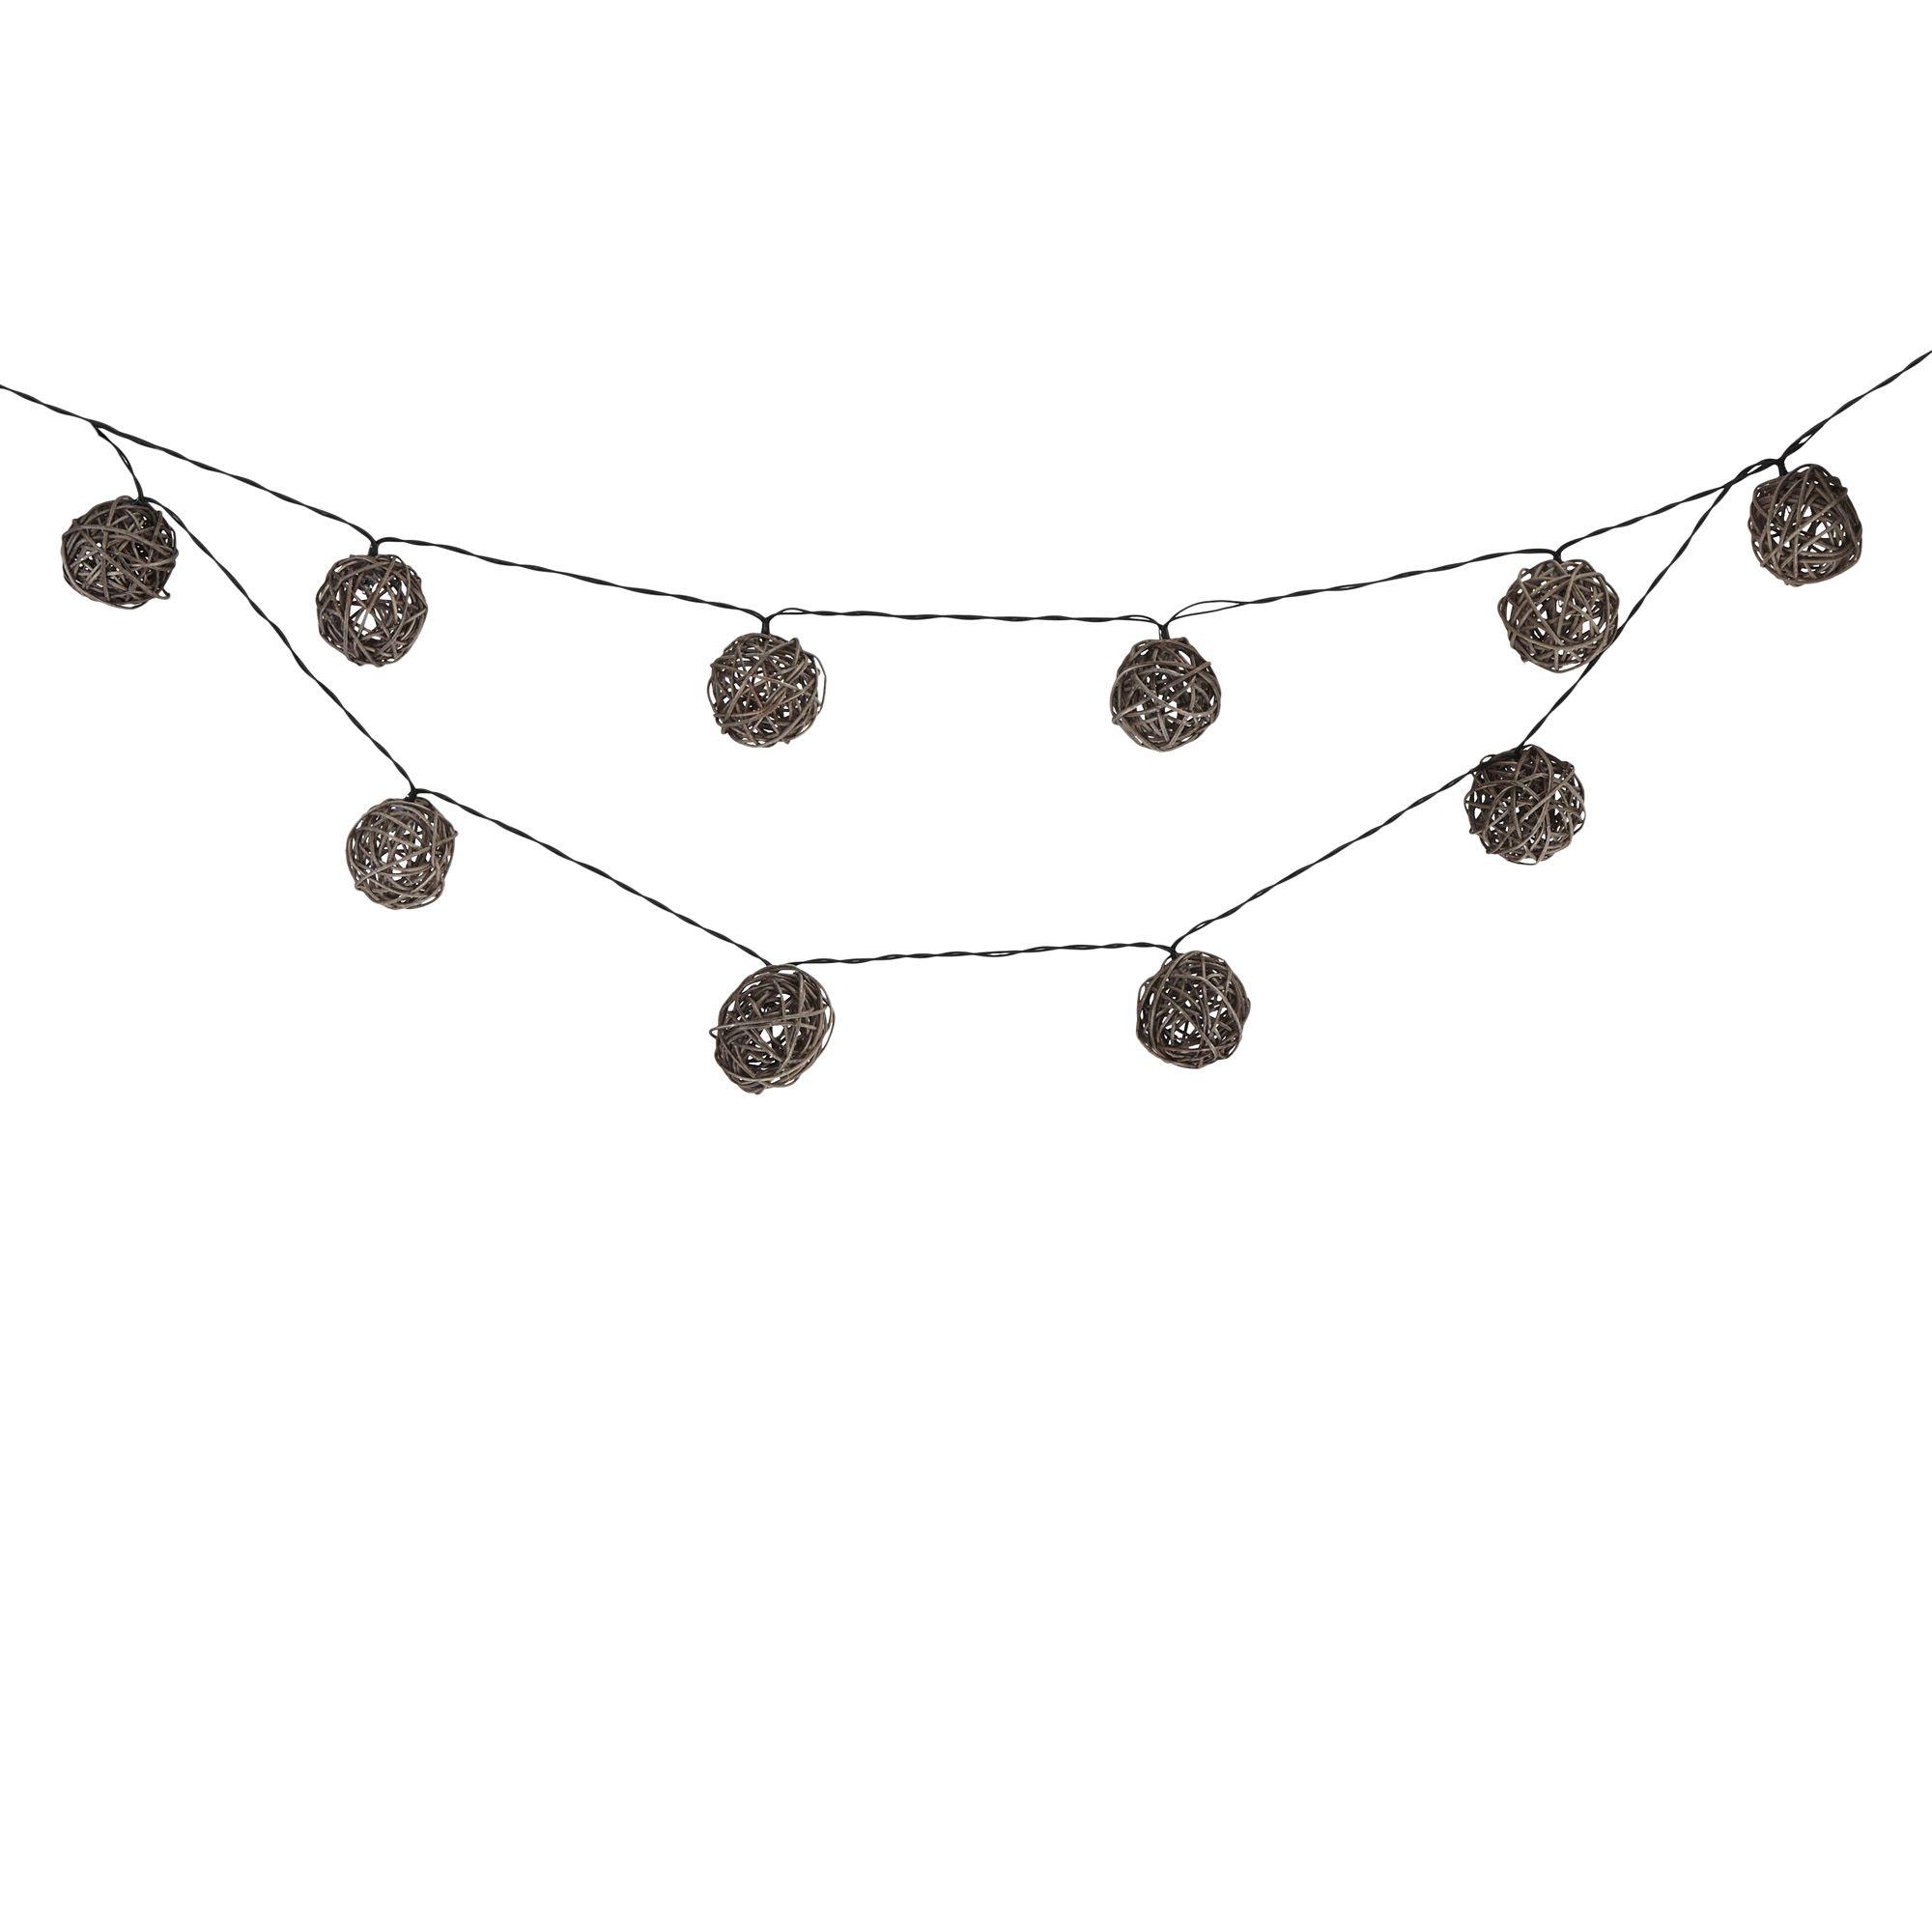 blooma bestia solar powered grey 20 led ball string lights